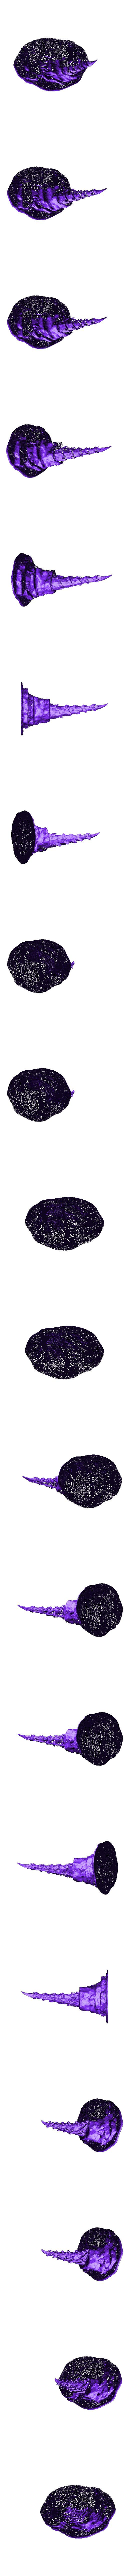 47_4E.stl Download free STL file tyty tyran tyranid 40k starship trooper notable small terrain remix Part 4 • Template to 3D print, Alario